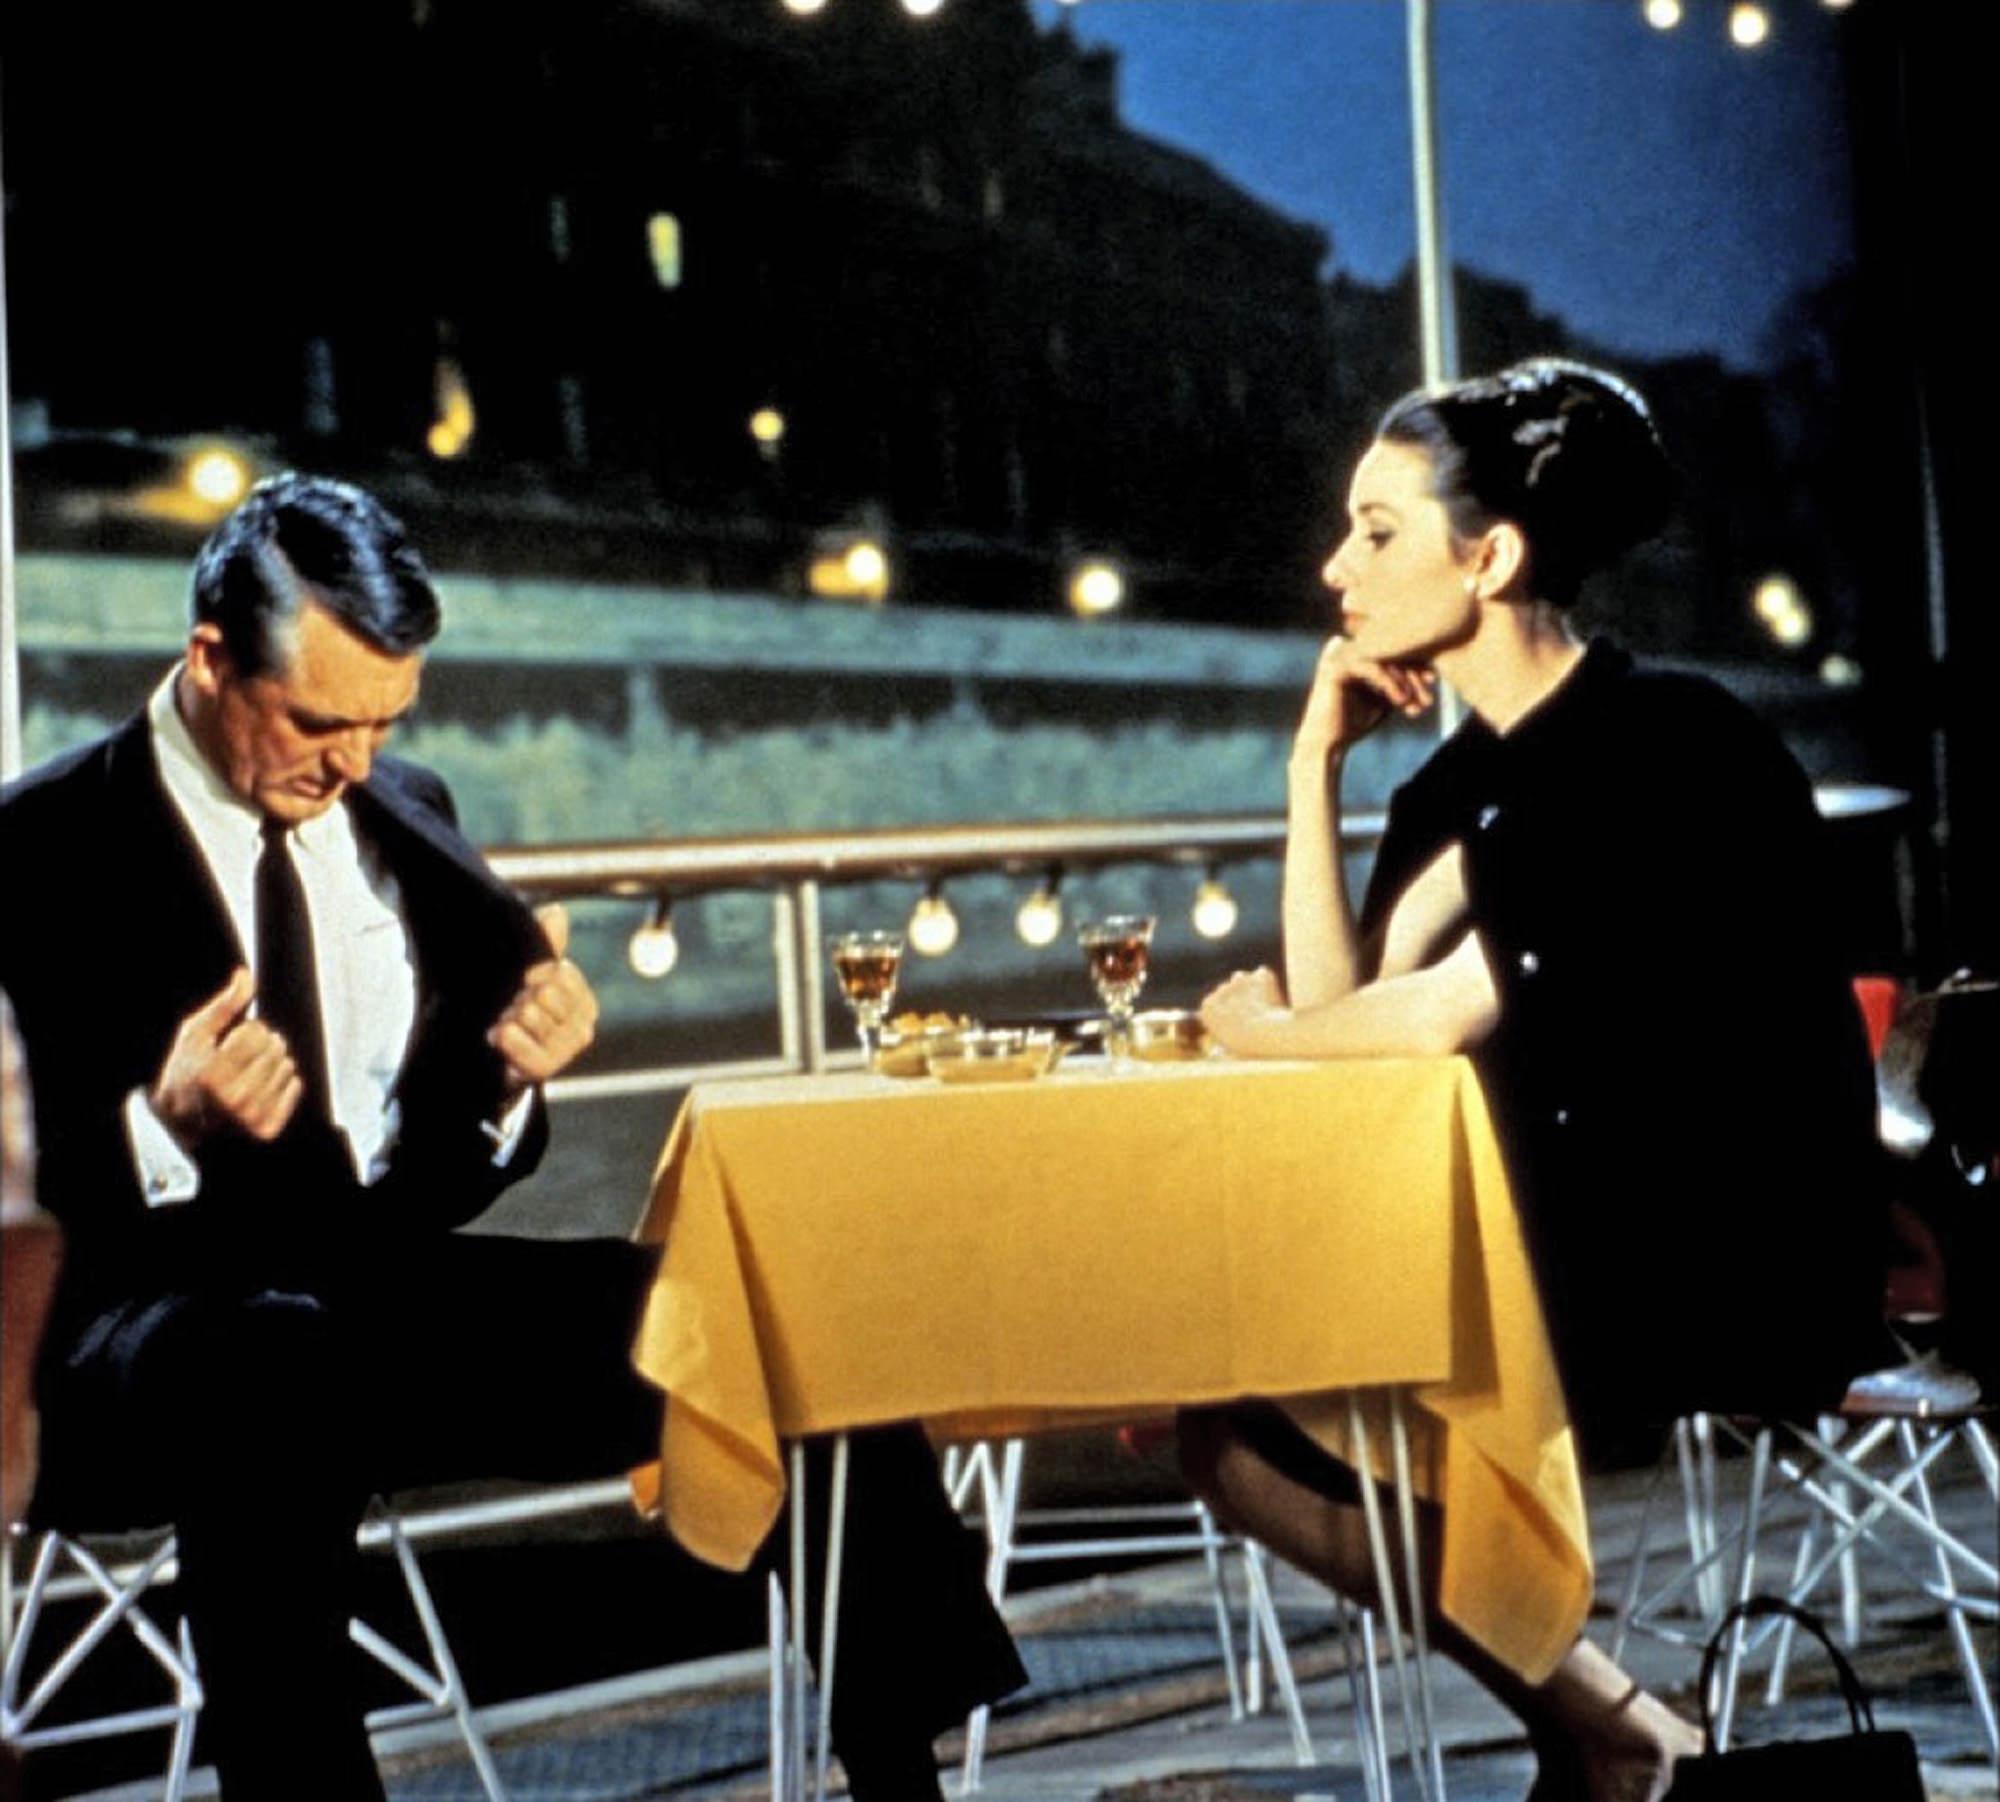 Audrey Hepburn, Charade (1963) starring Cary Grant